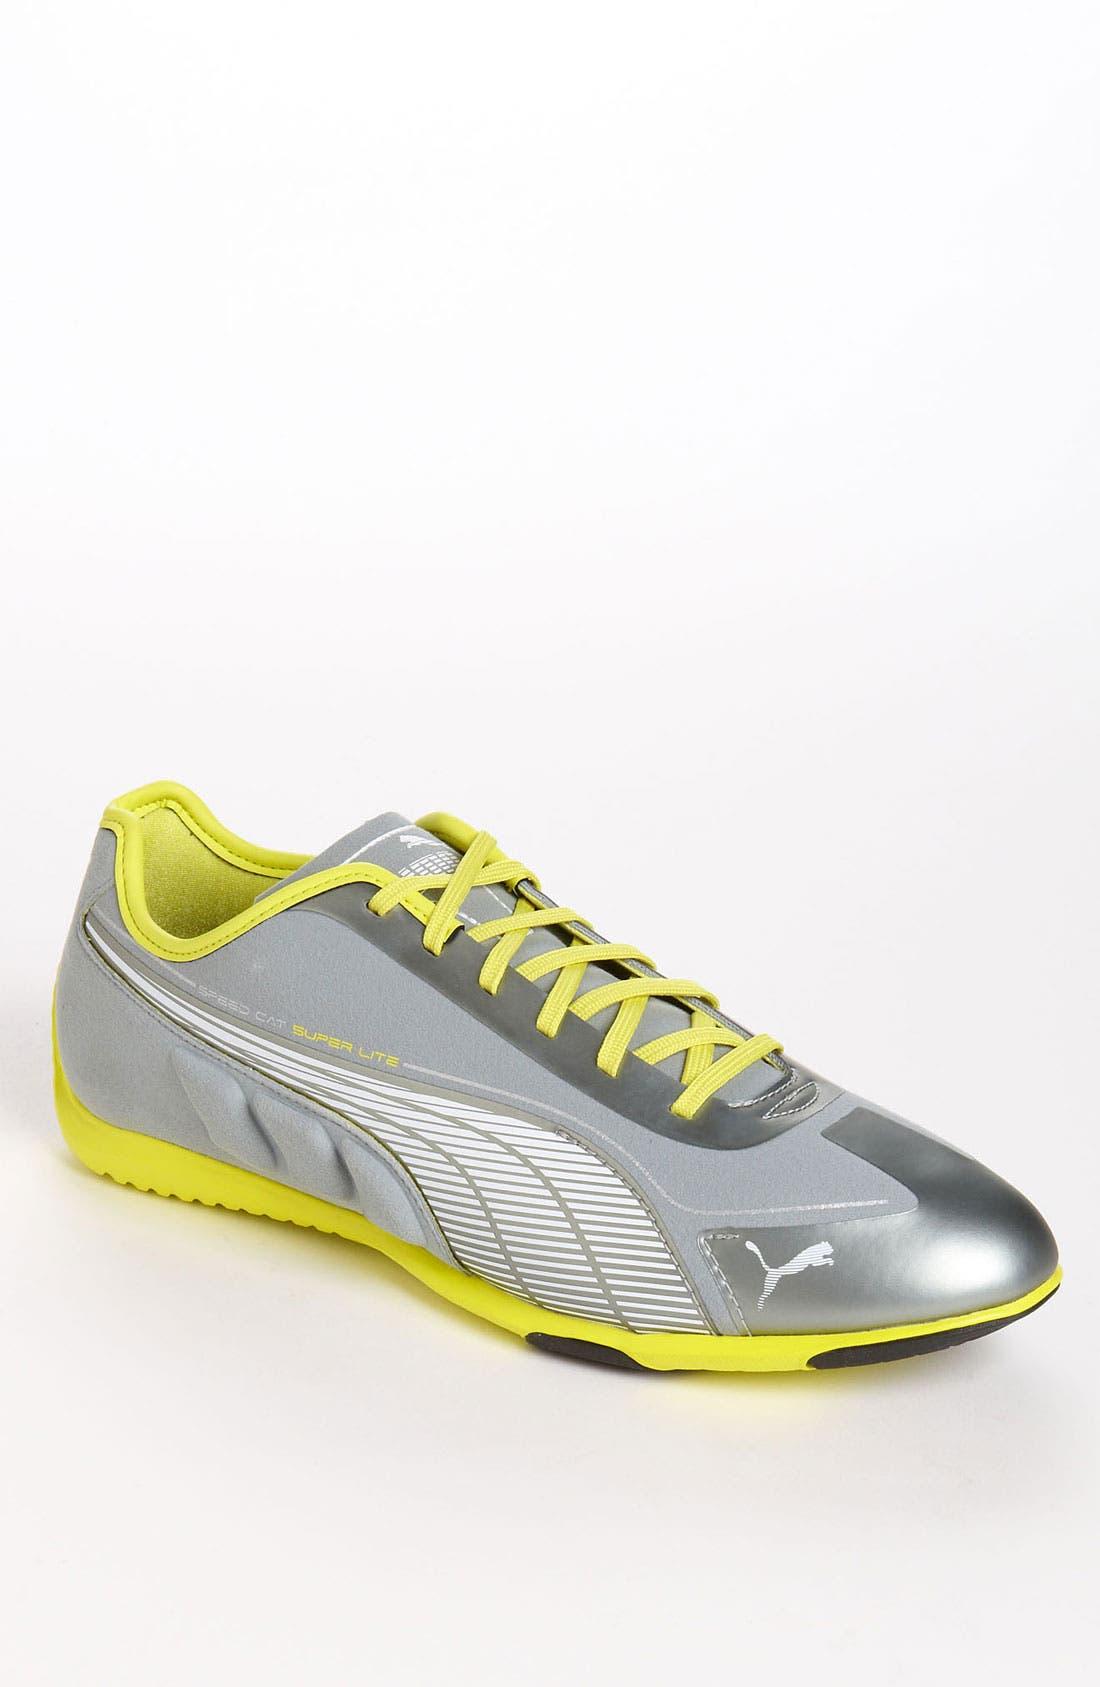 Main Image - PUMA 'Speed Cat Super Lite' Sneaker (Men)